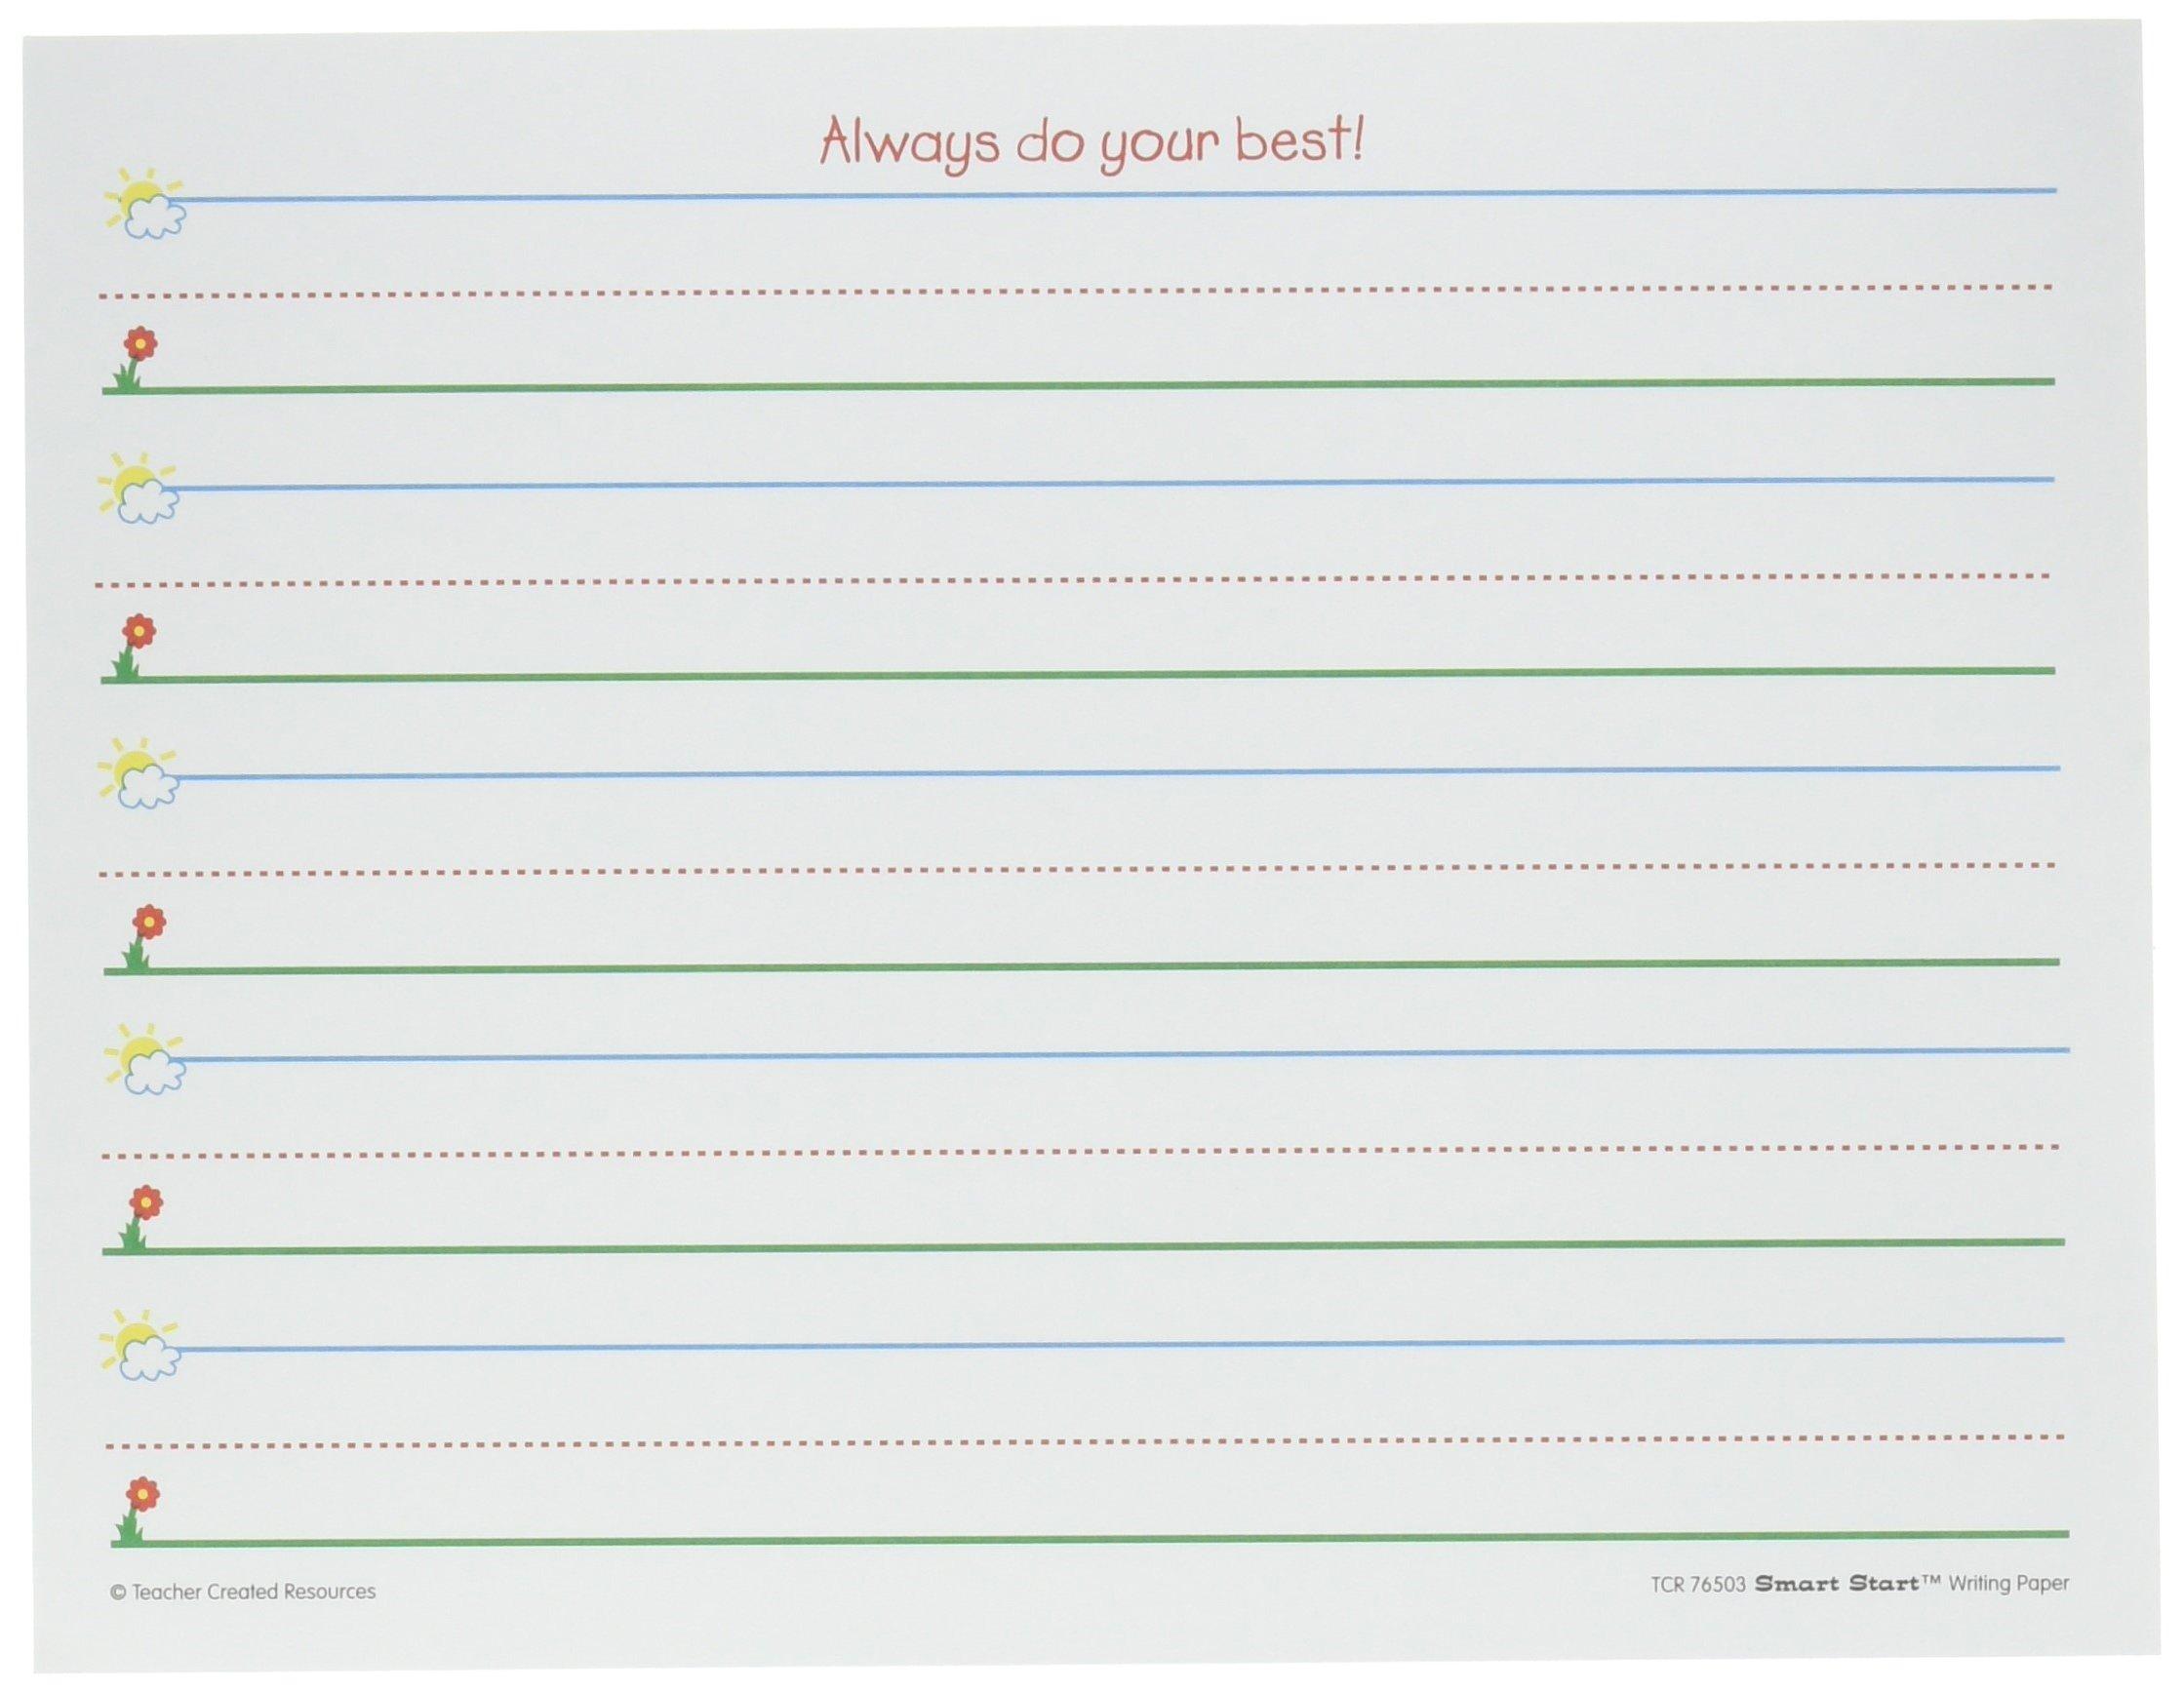 Teacher Created Resources (76503) Smart Start K-1 Writing Paper: 360 sheets